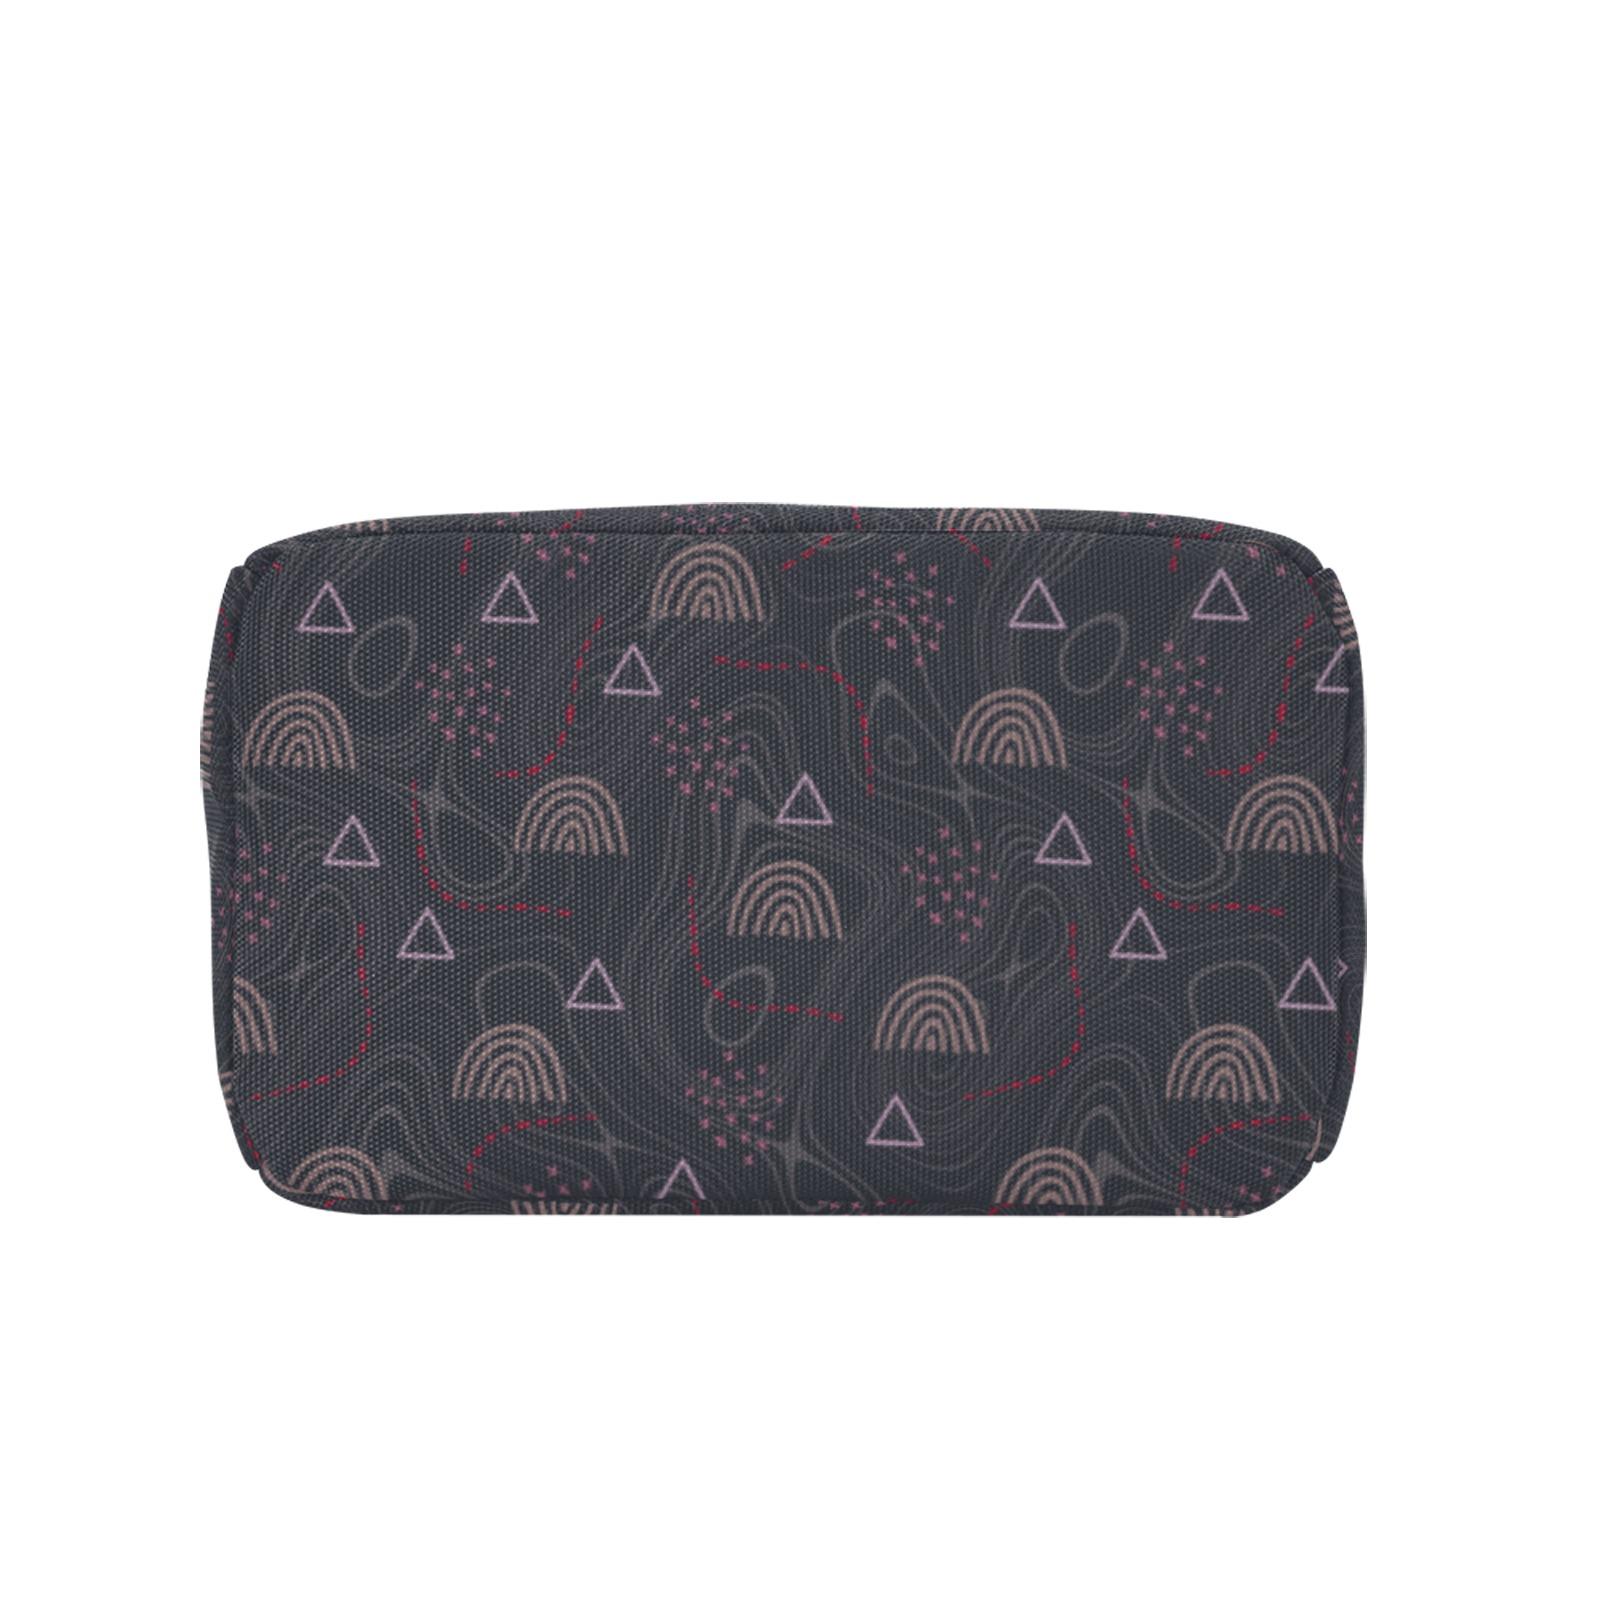 Rainbow, doodles Zipper Lunch Bag (Model 1720)